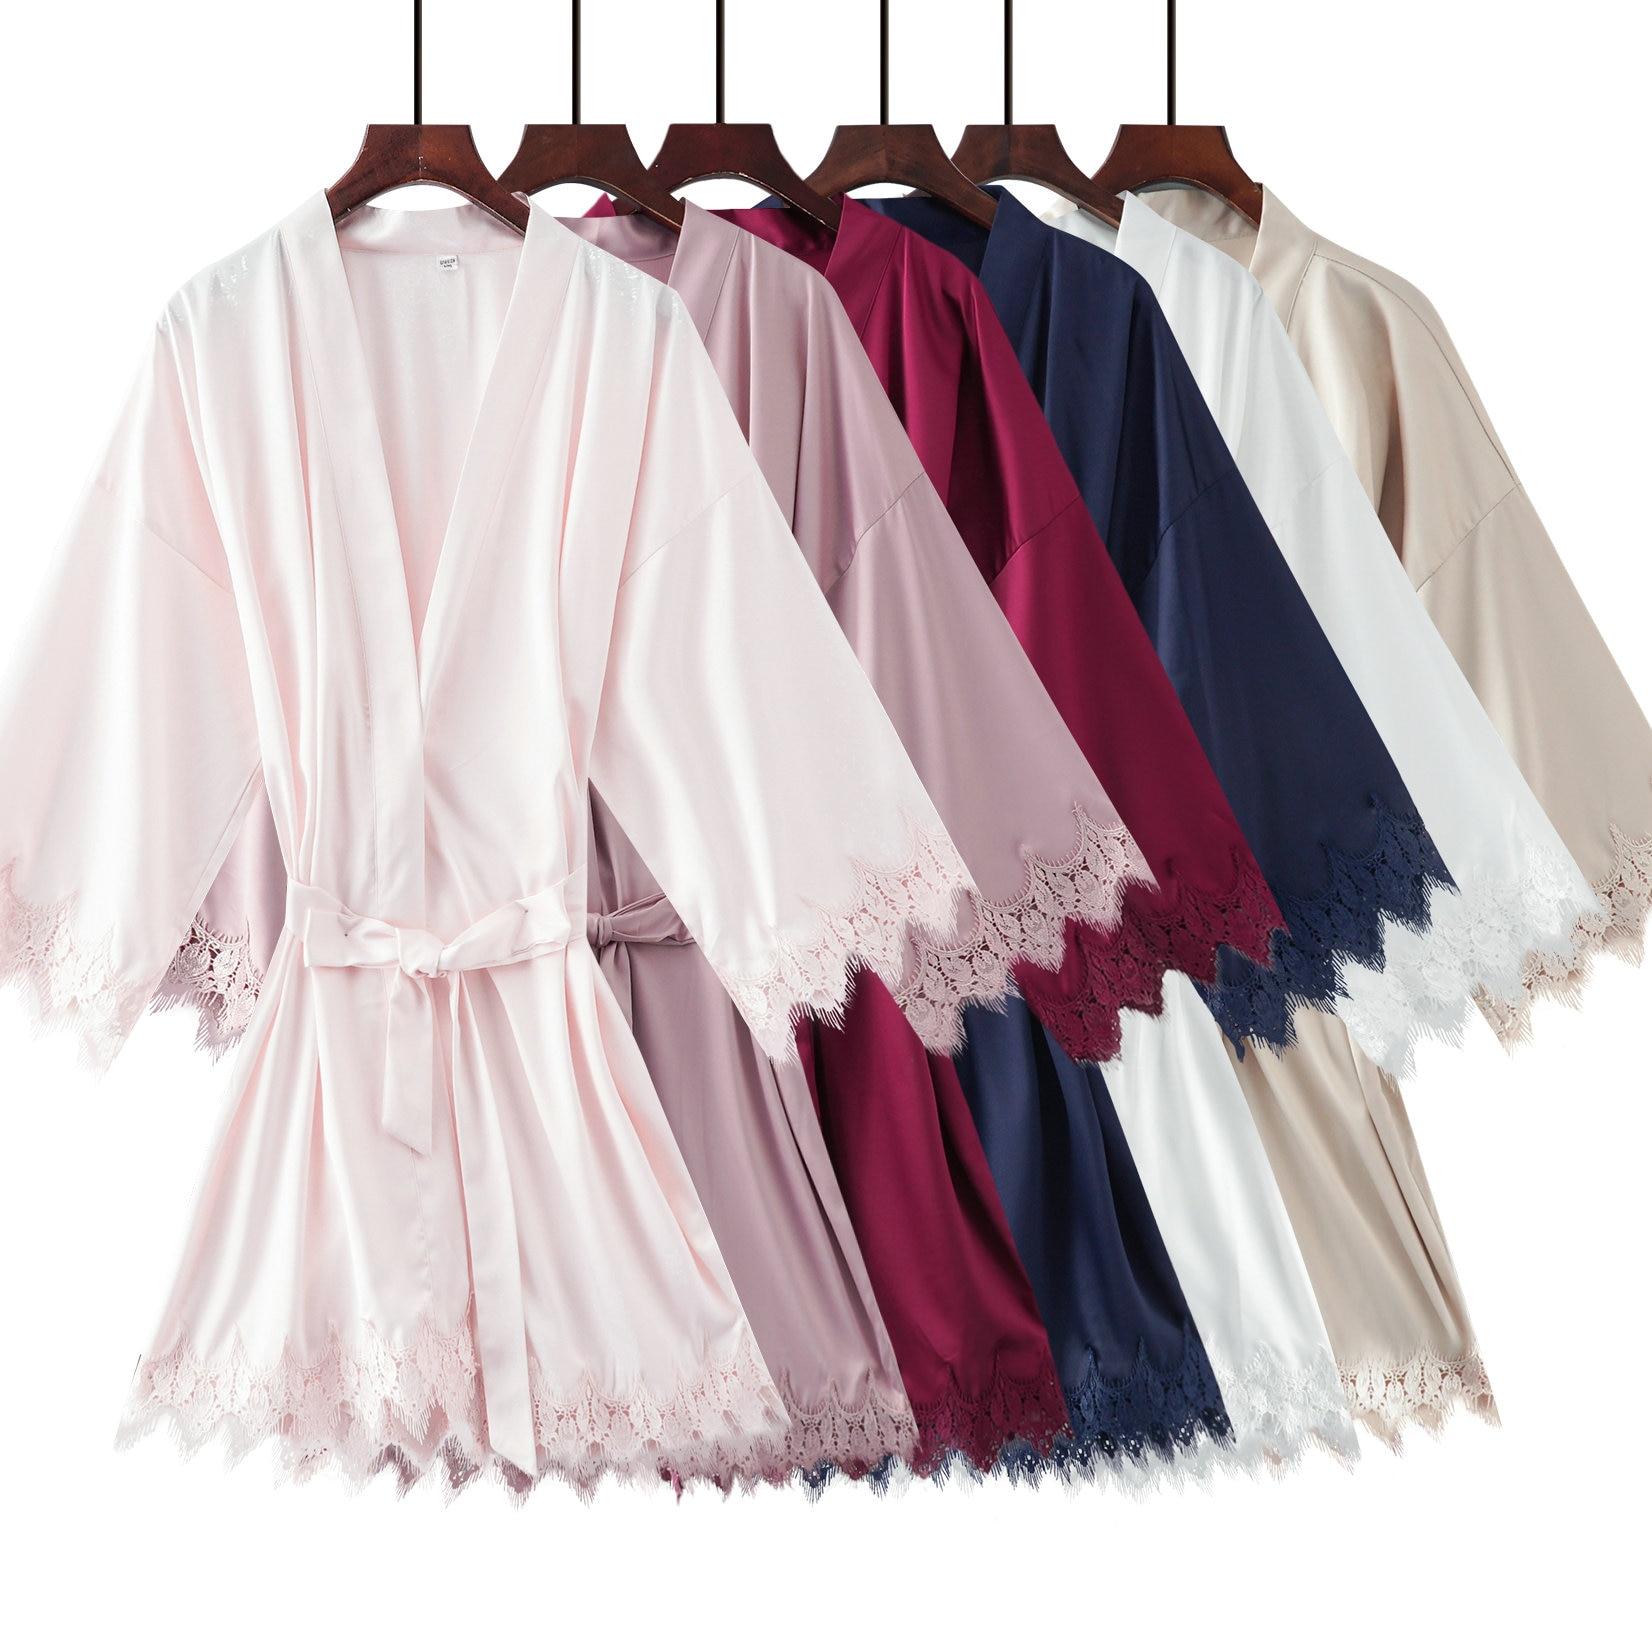 2019 Matt Satin Lace Robe with Trim Gown Bridal Wedding Bride Robes Bridesmaid Kimono Robe Plus Size Women Bathrobe Dress Gown-in Robes from Underwear & Sleepwears